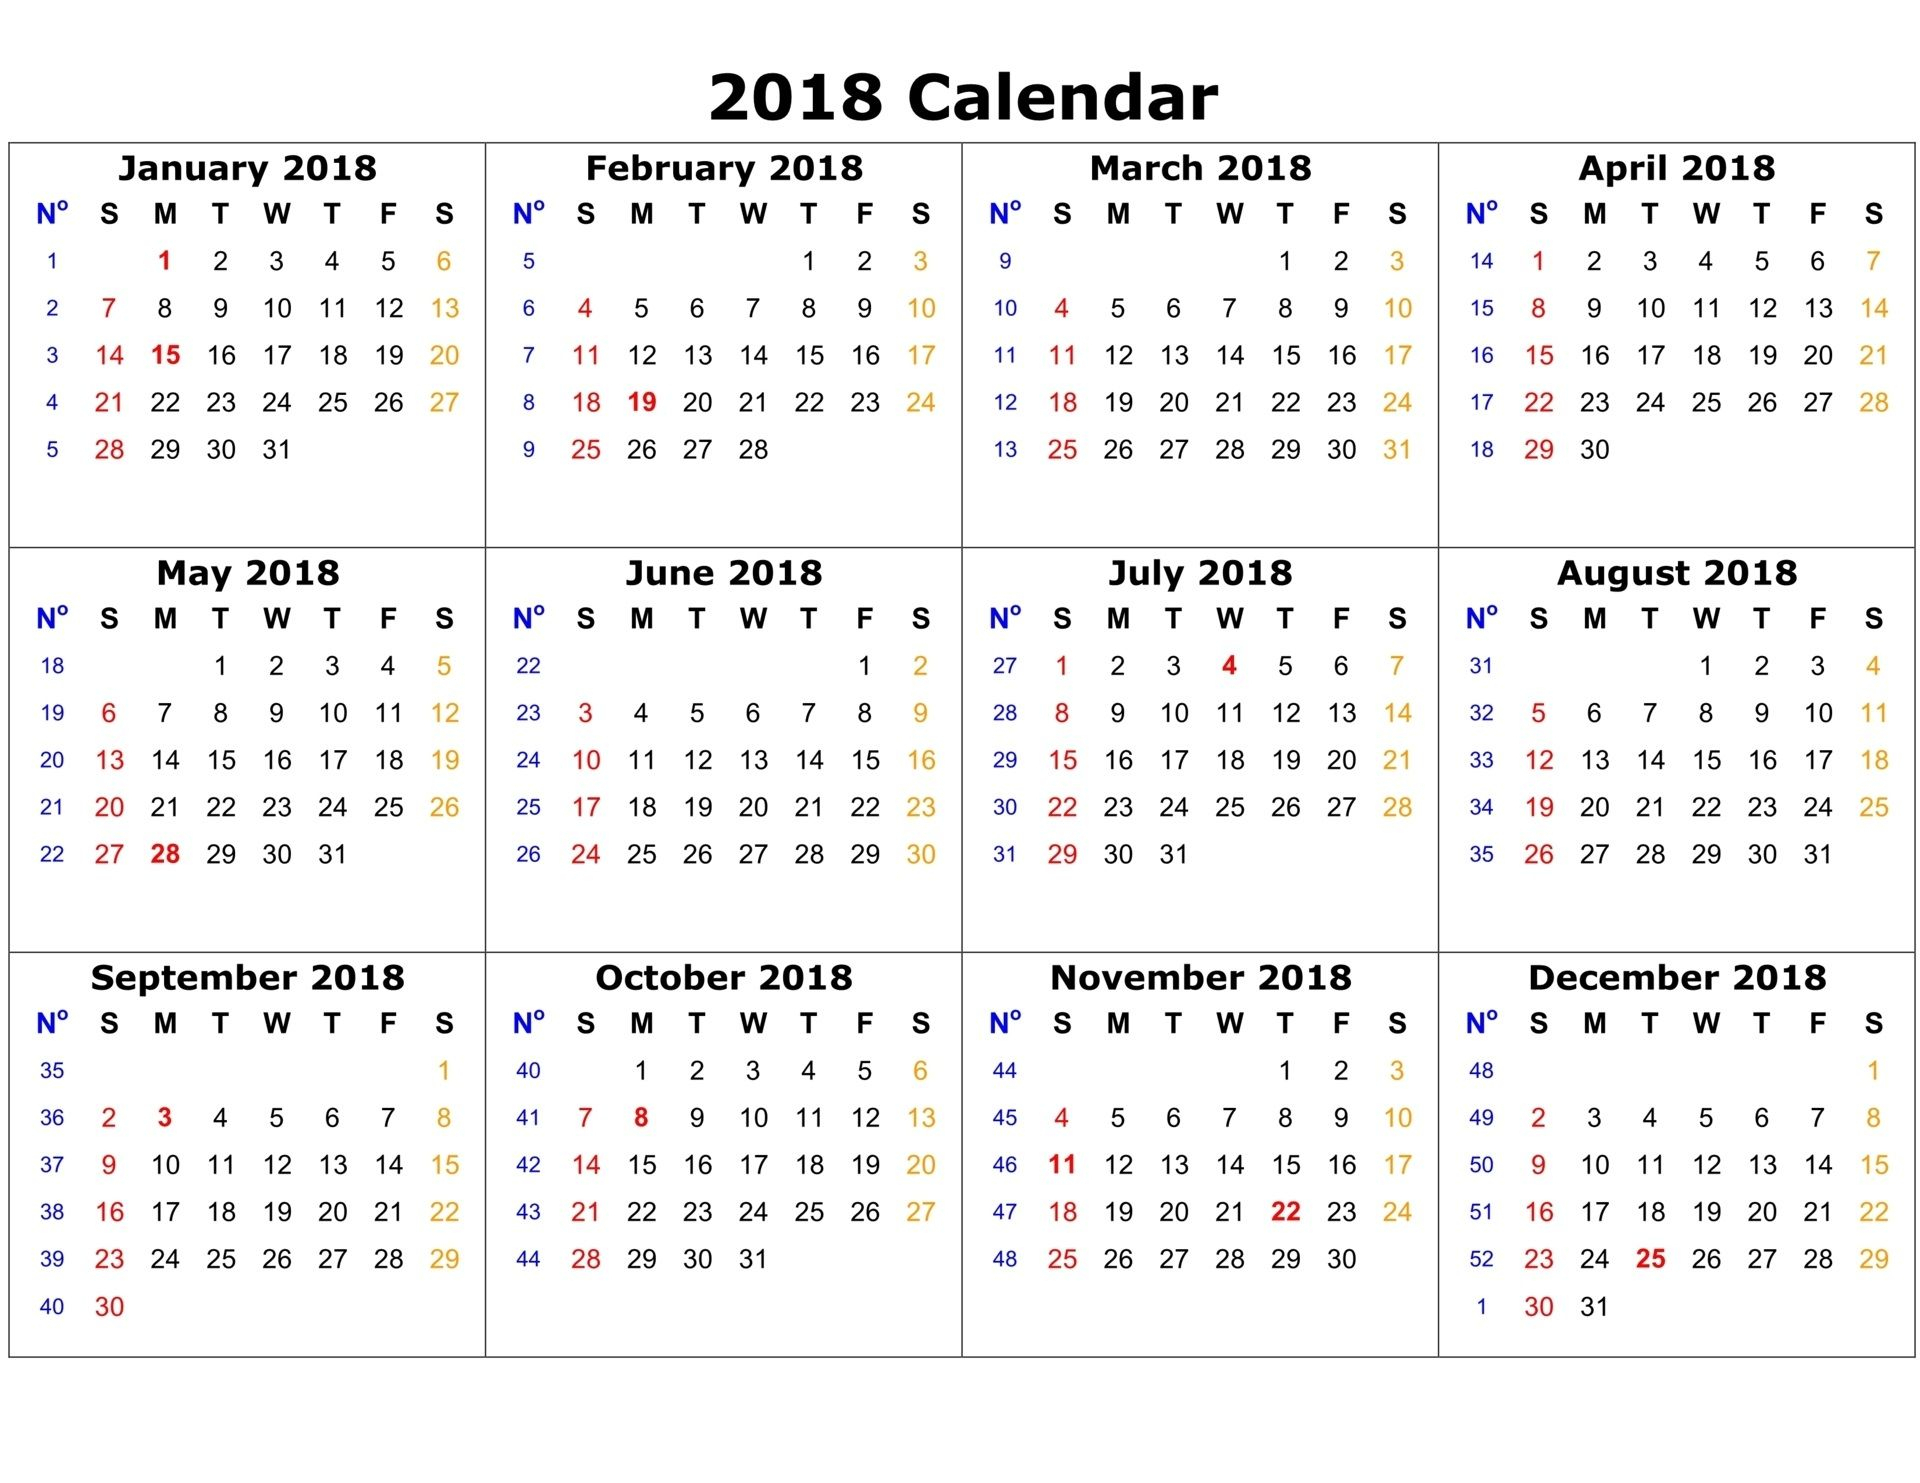 Free Printable Calendar 2018 | Printable Calendar | 2018 Calendar pertaining to Blank Printable Calendar 12 Month